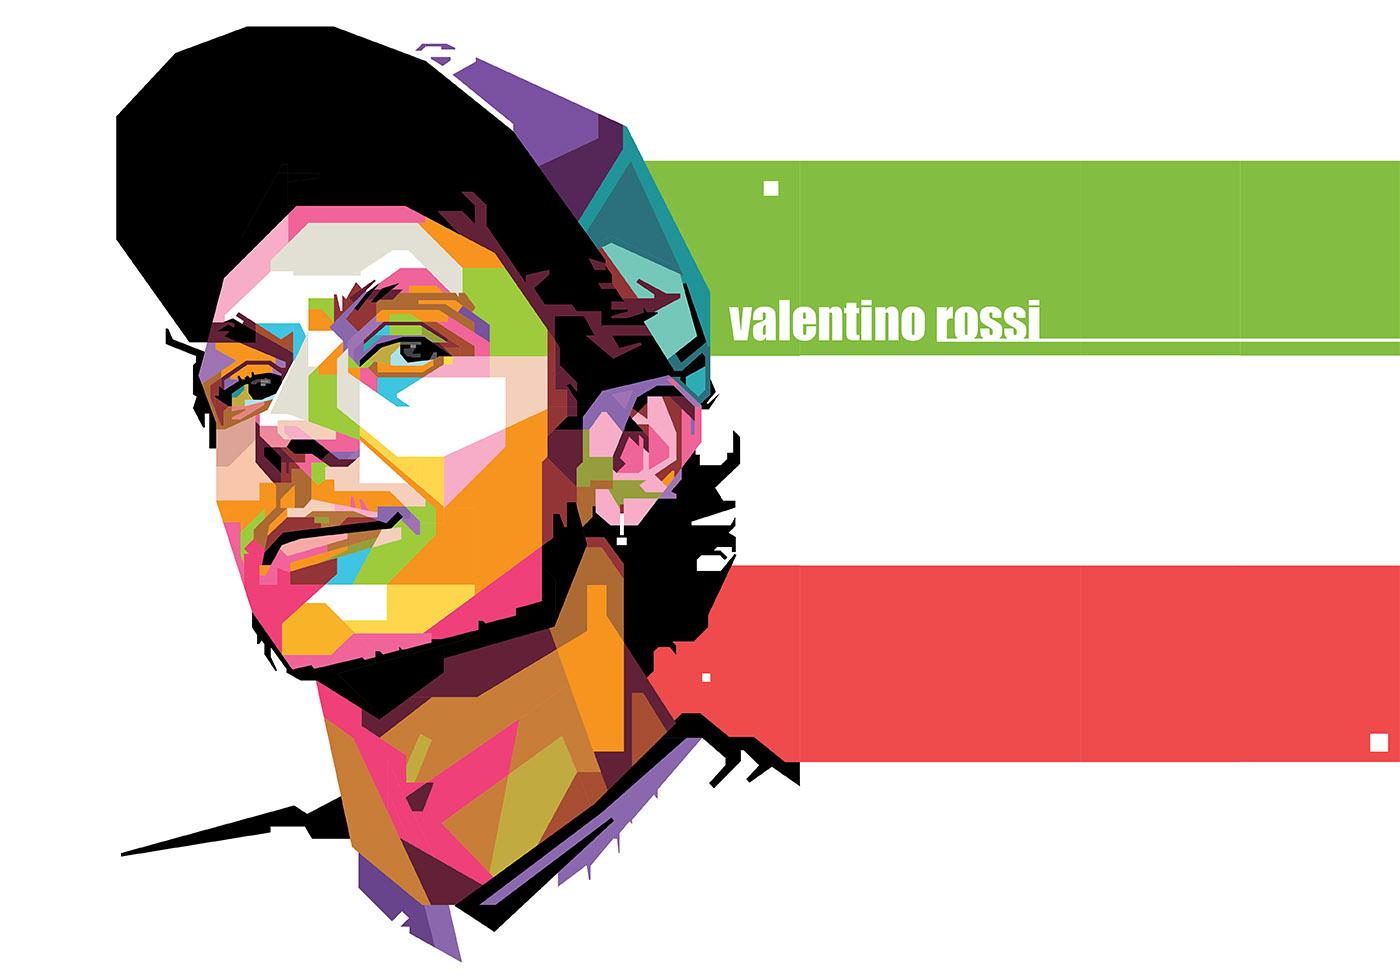 valentino rossi sport life wpap download free vector